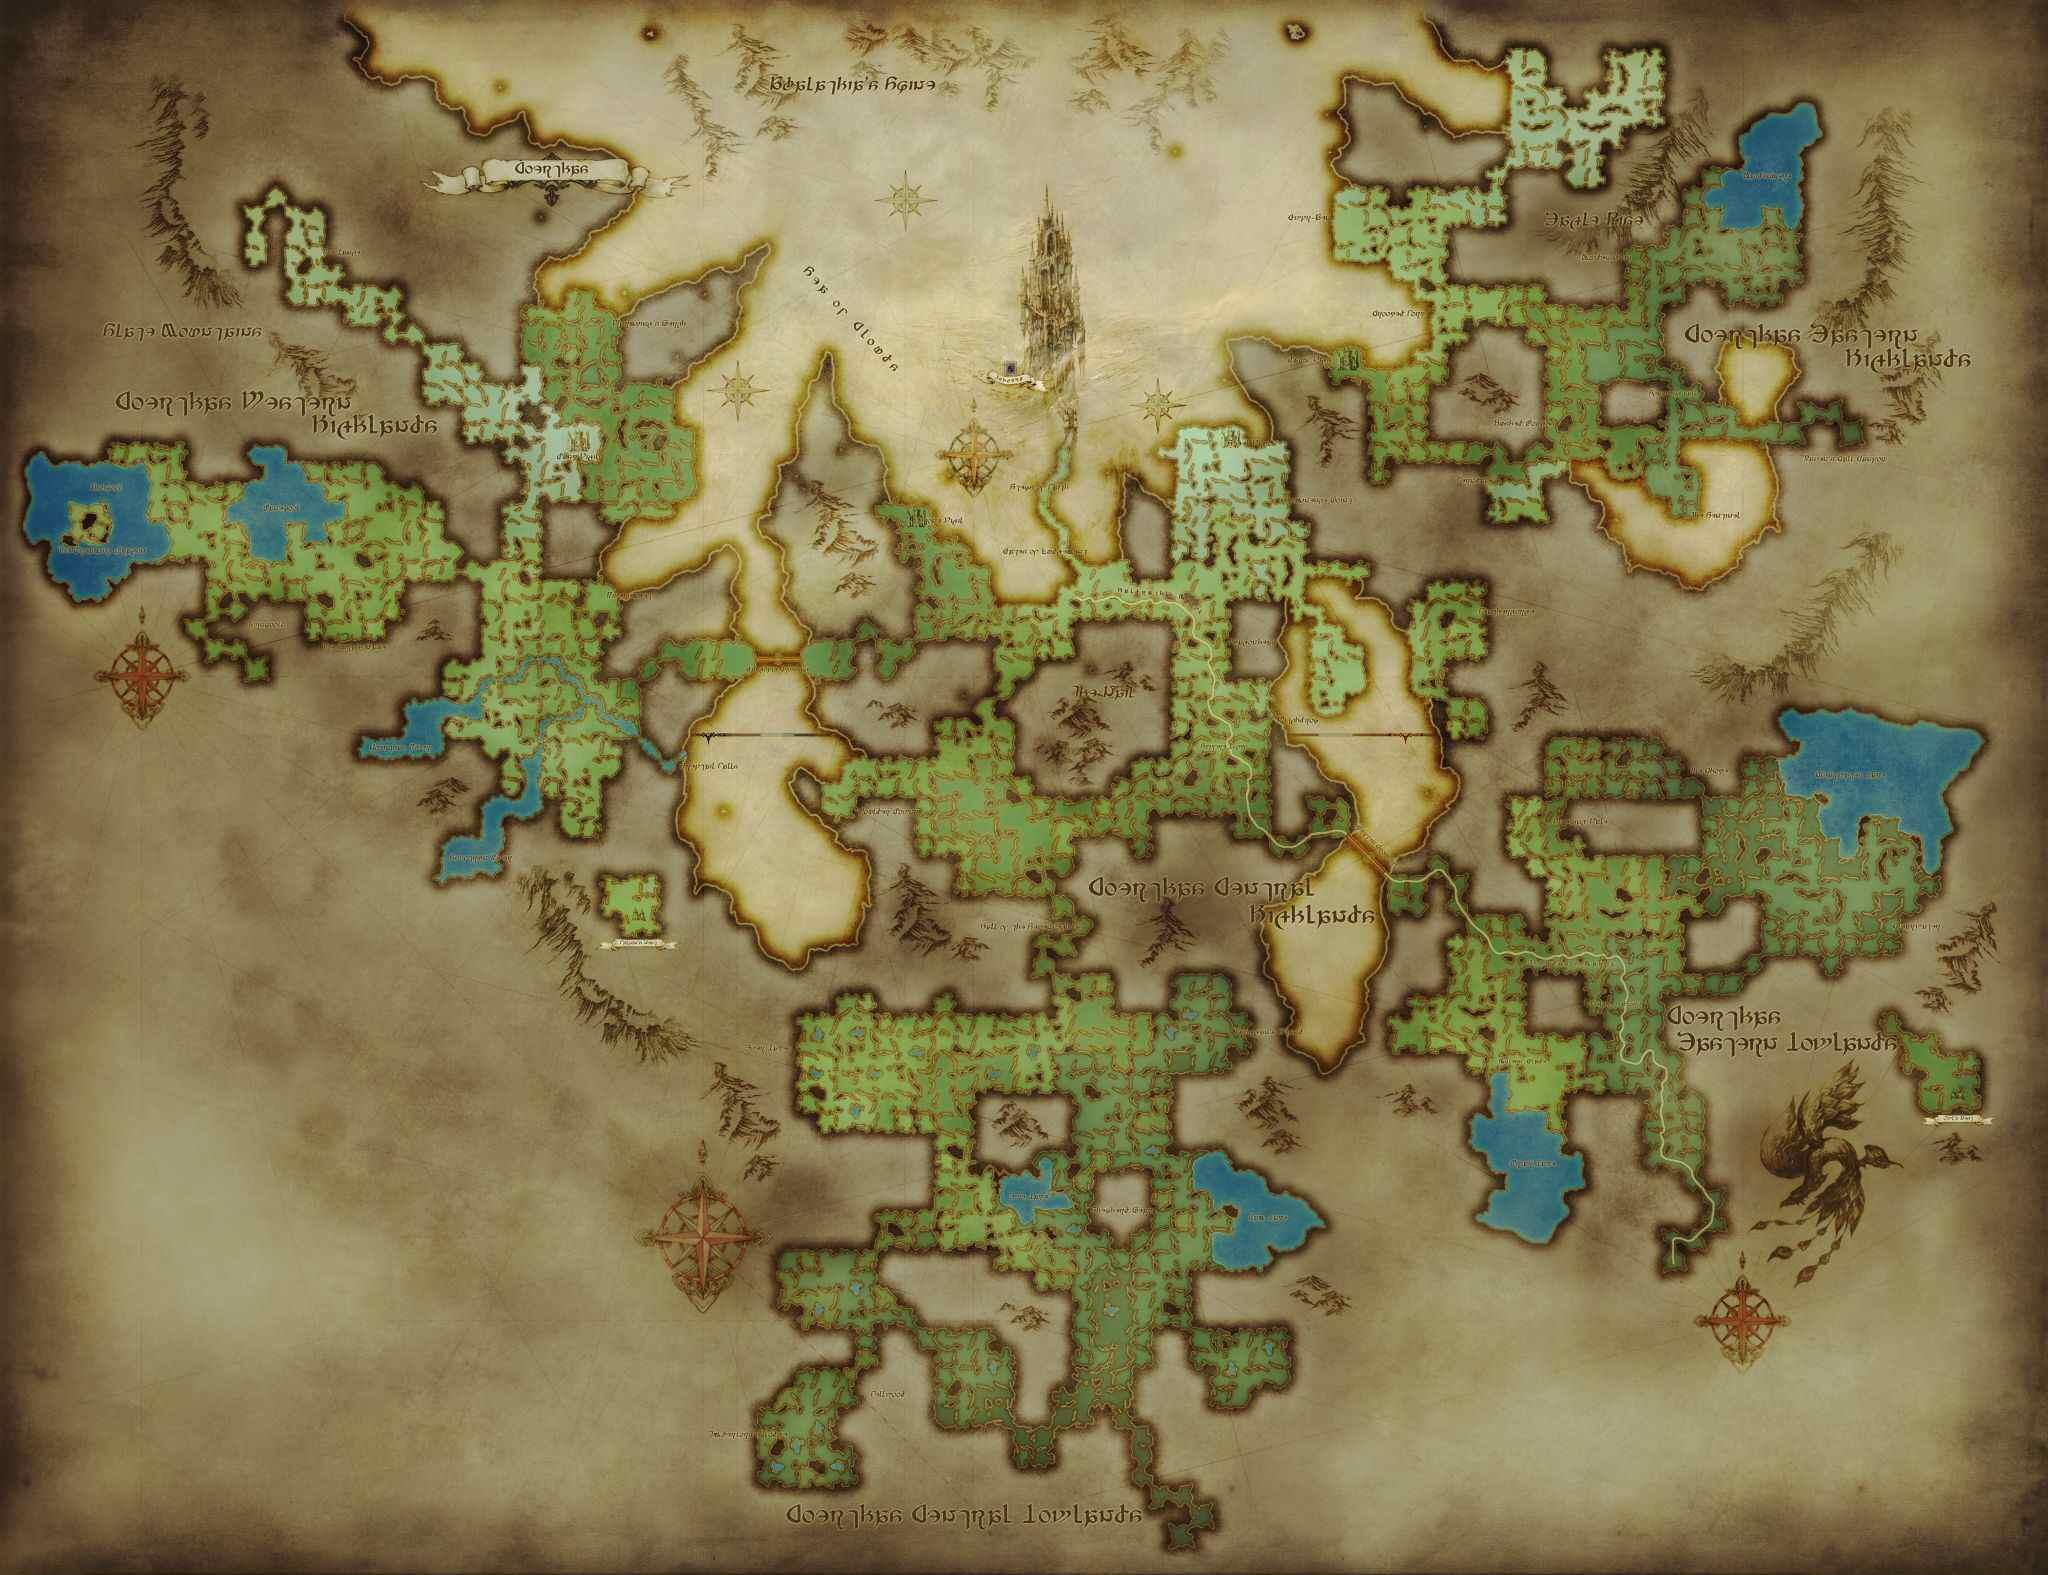 Ffxiv Alt Leveling final fantasy xiv forum